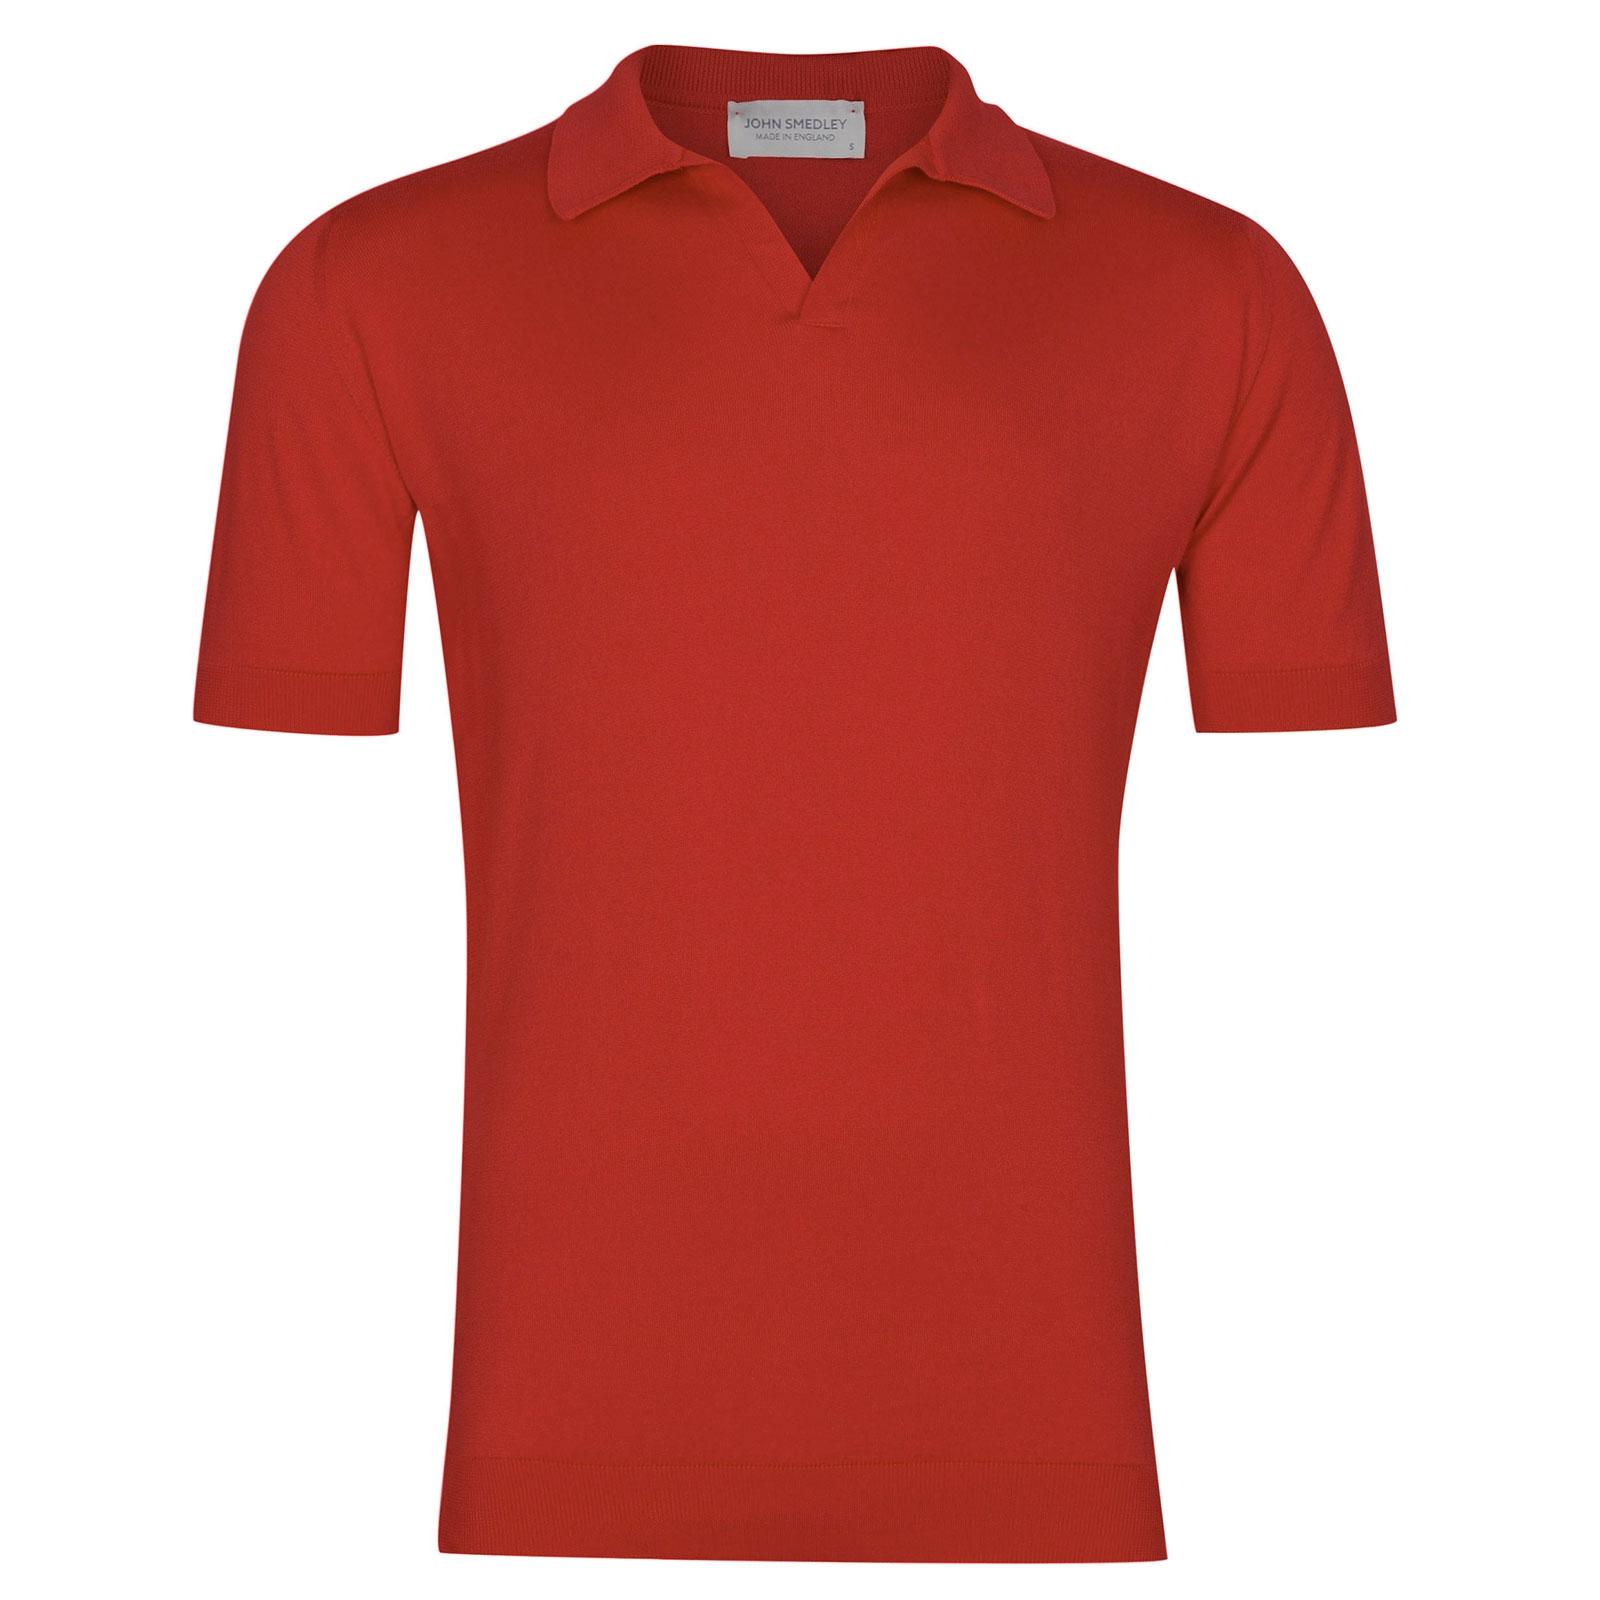 John Smedley Noah in Red Admiral Shirt-XLG